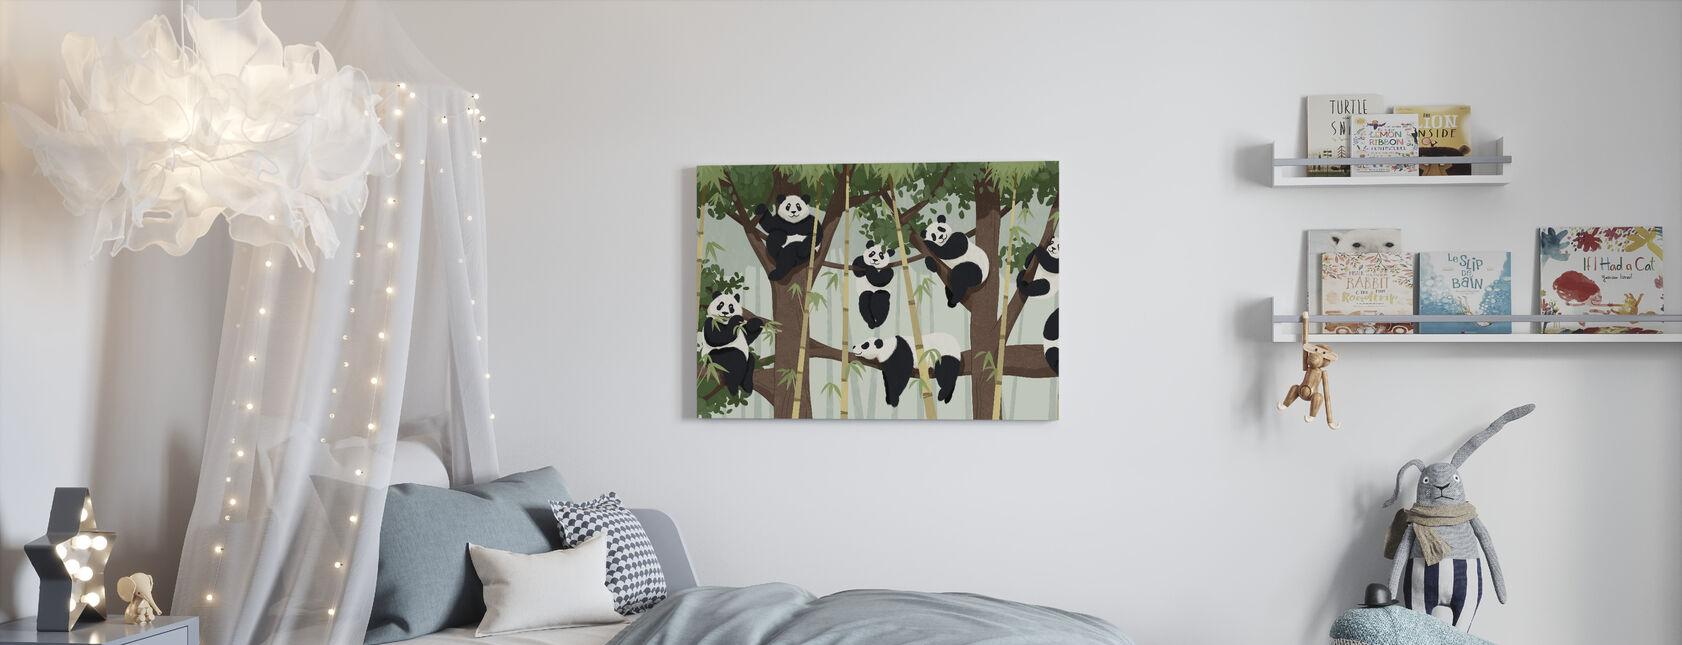 Panda Trees - Canvas print - Kids Room